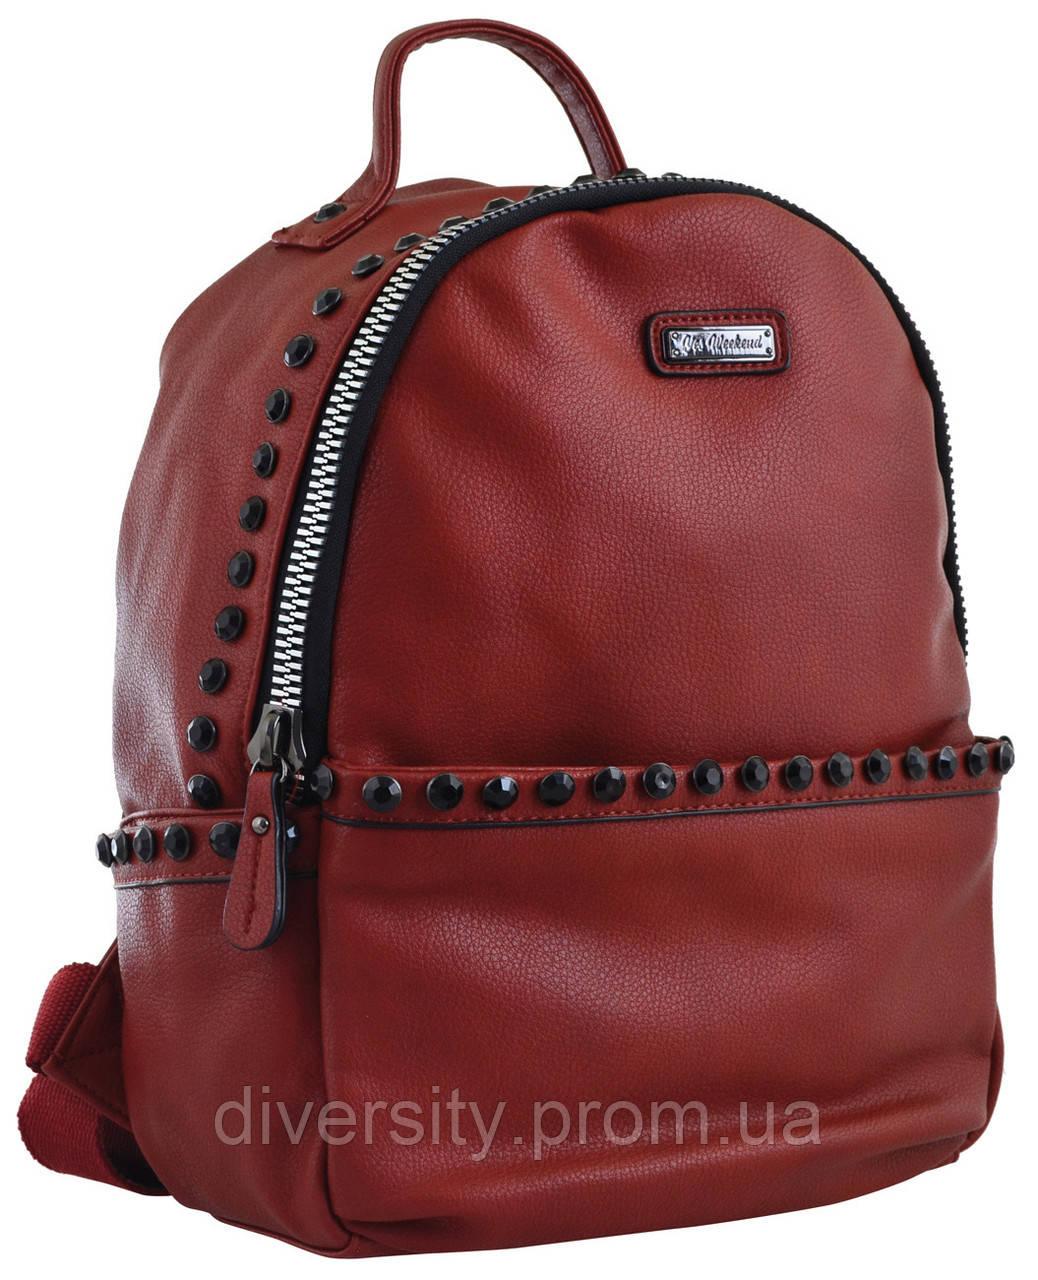 Женский рюкзак YES YW-15, кирпичный